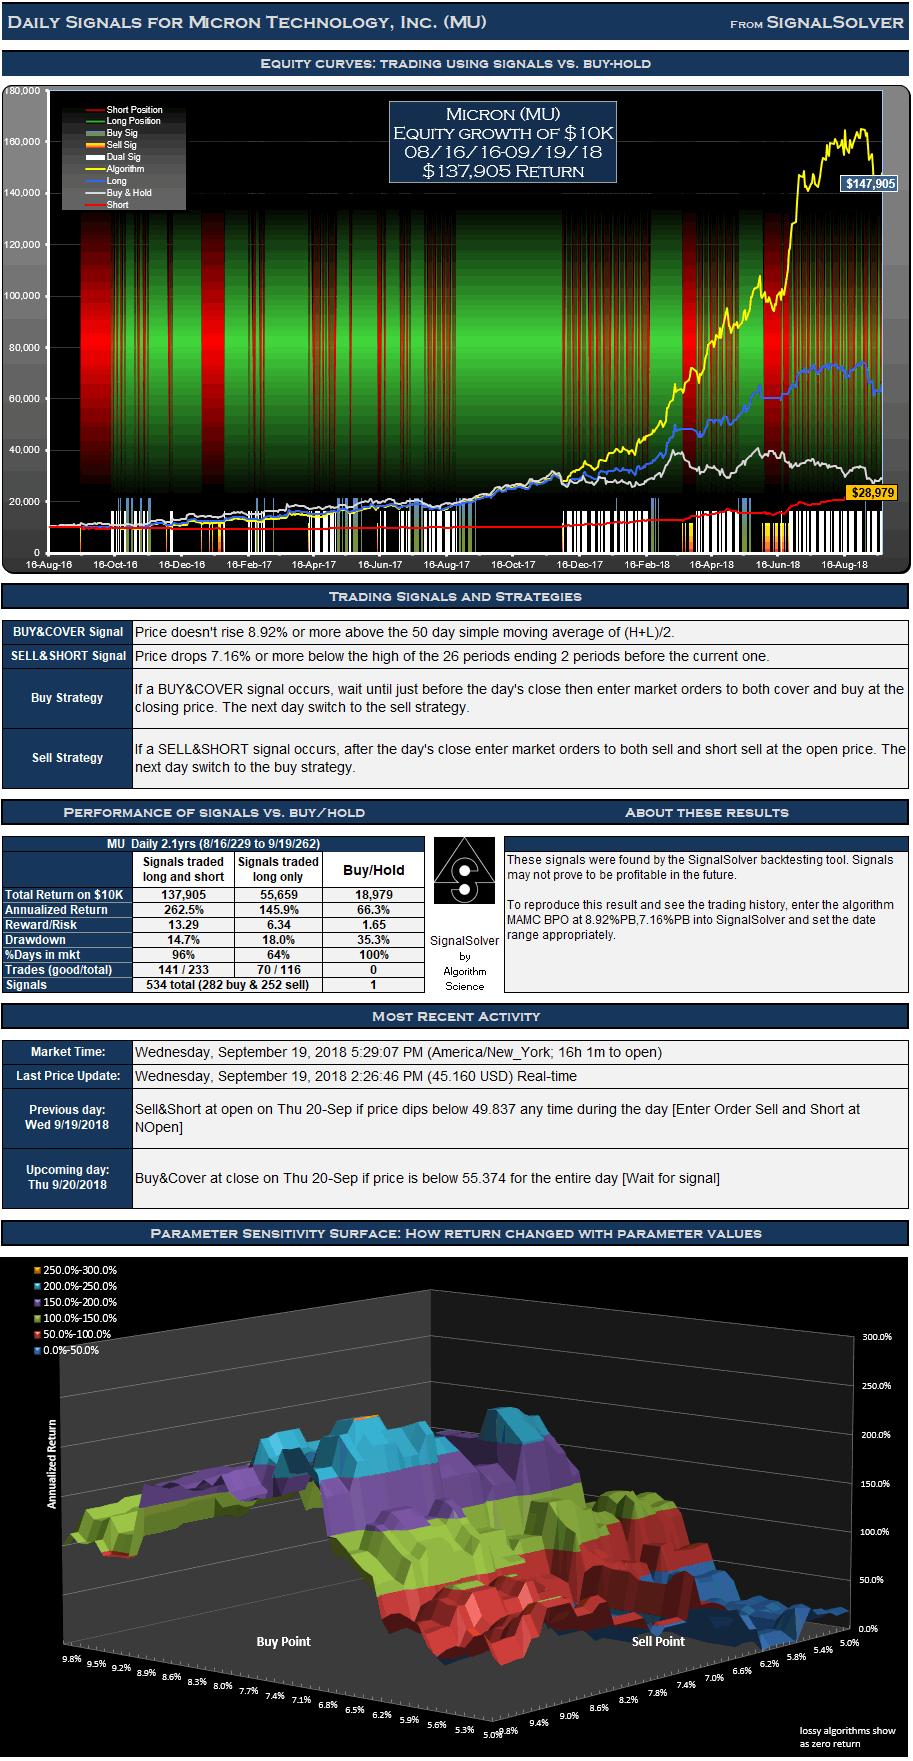 MU Trading Signals Daily